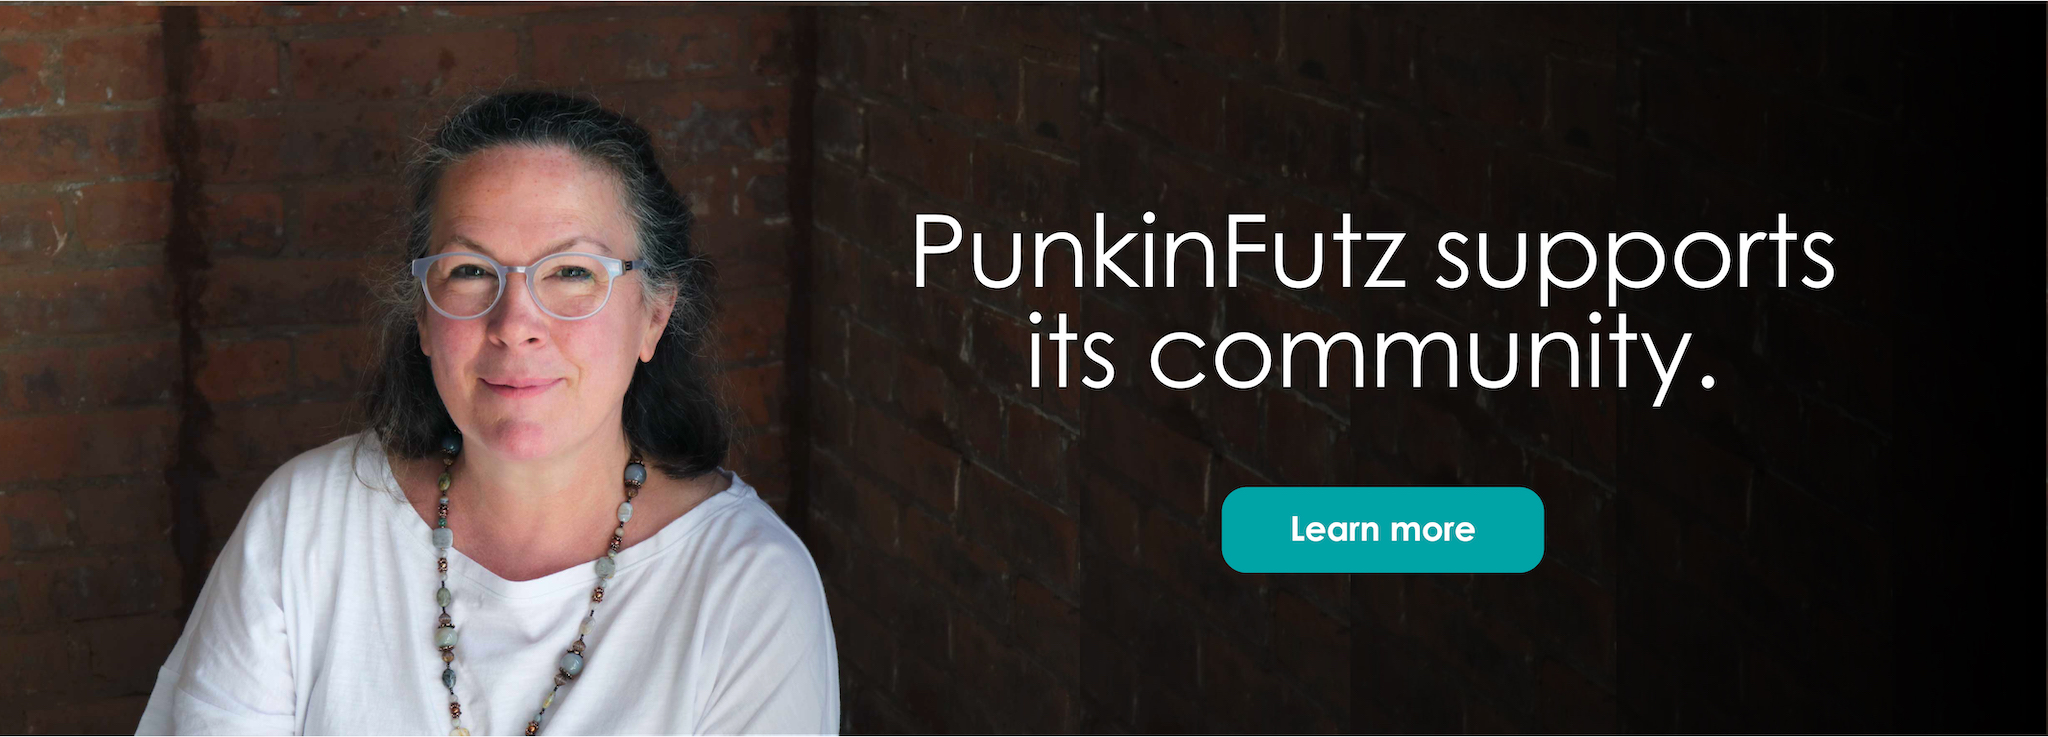 PunkinFutz Supports its community.